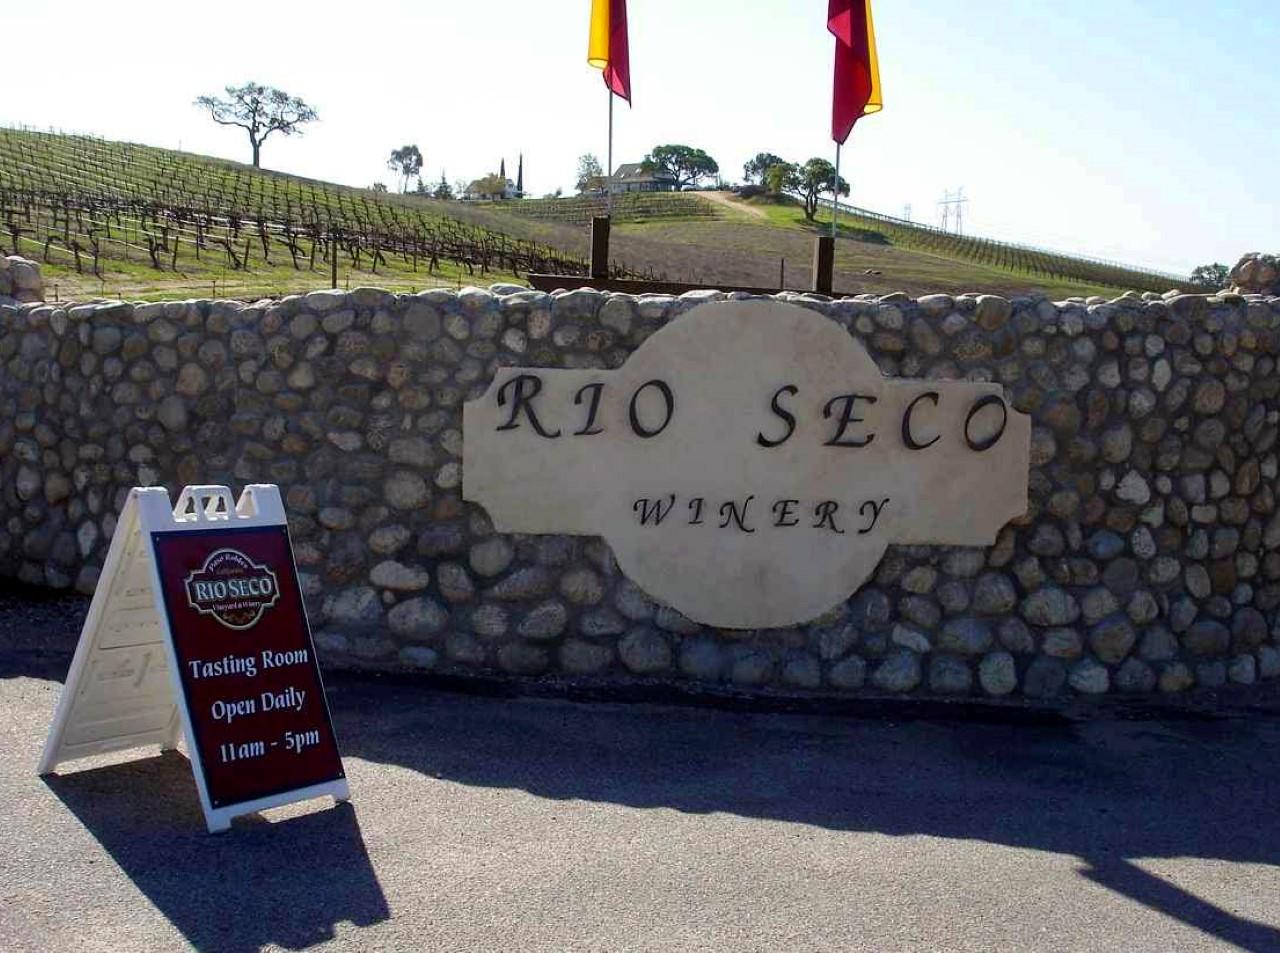 Rio Seco Winery sign